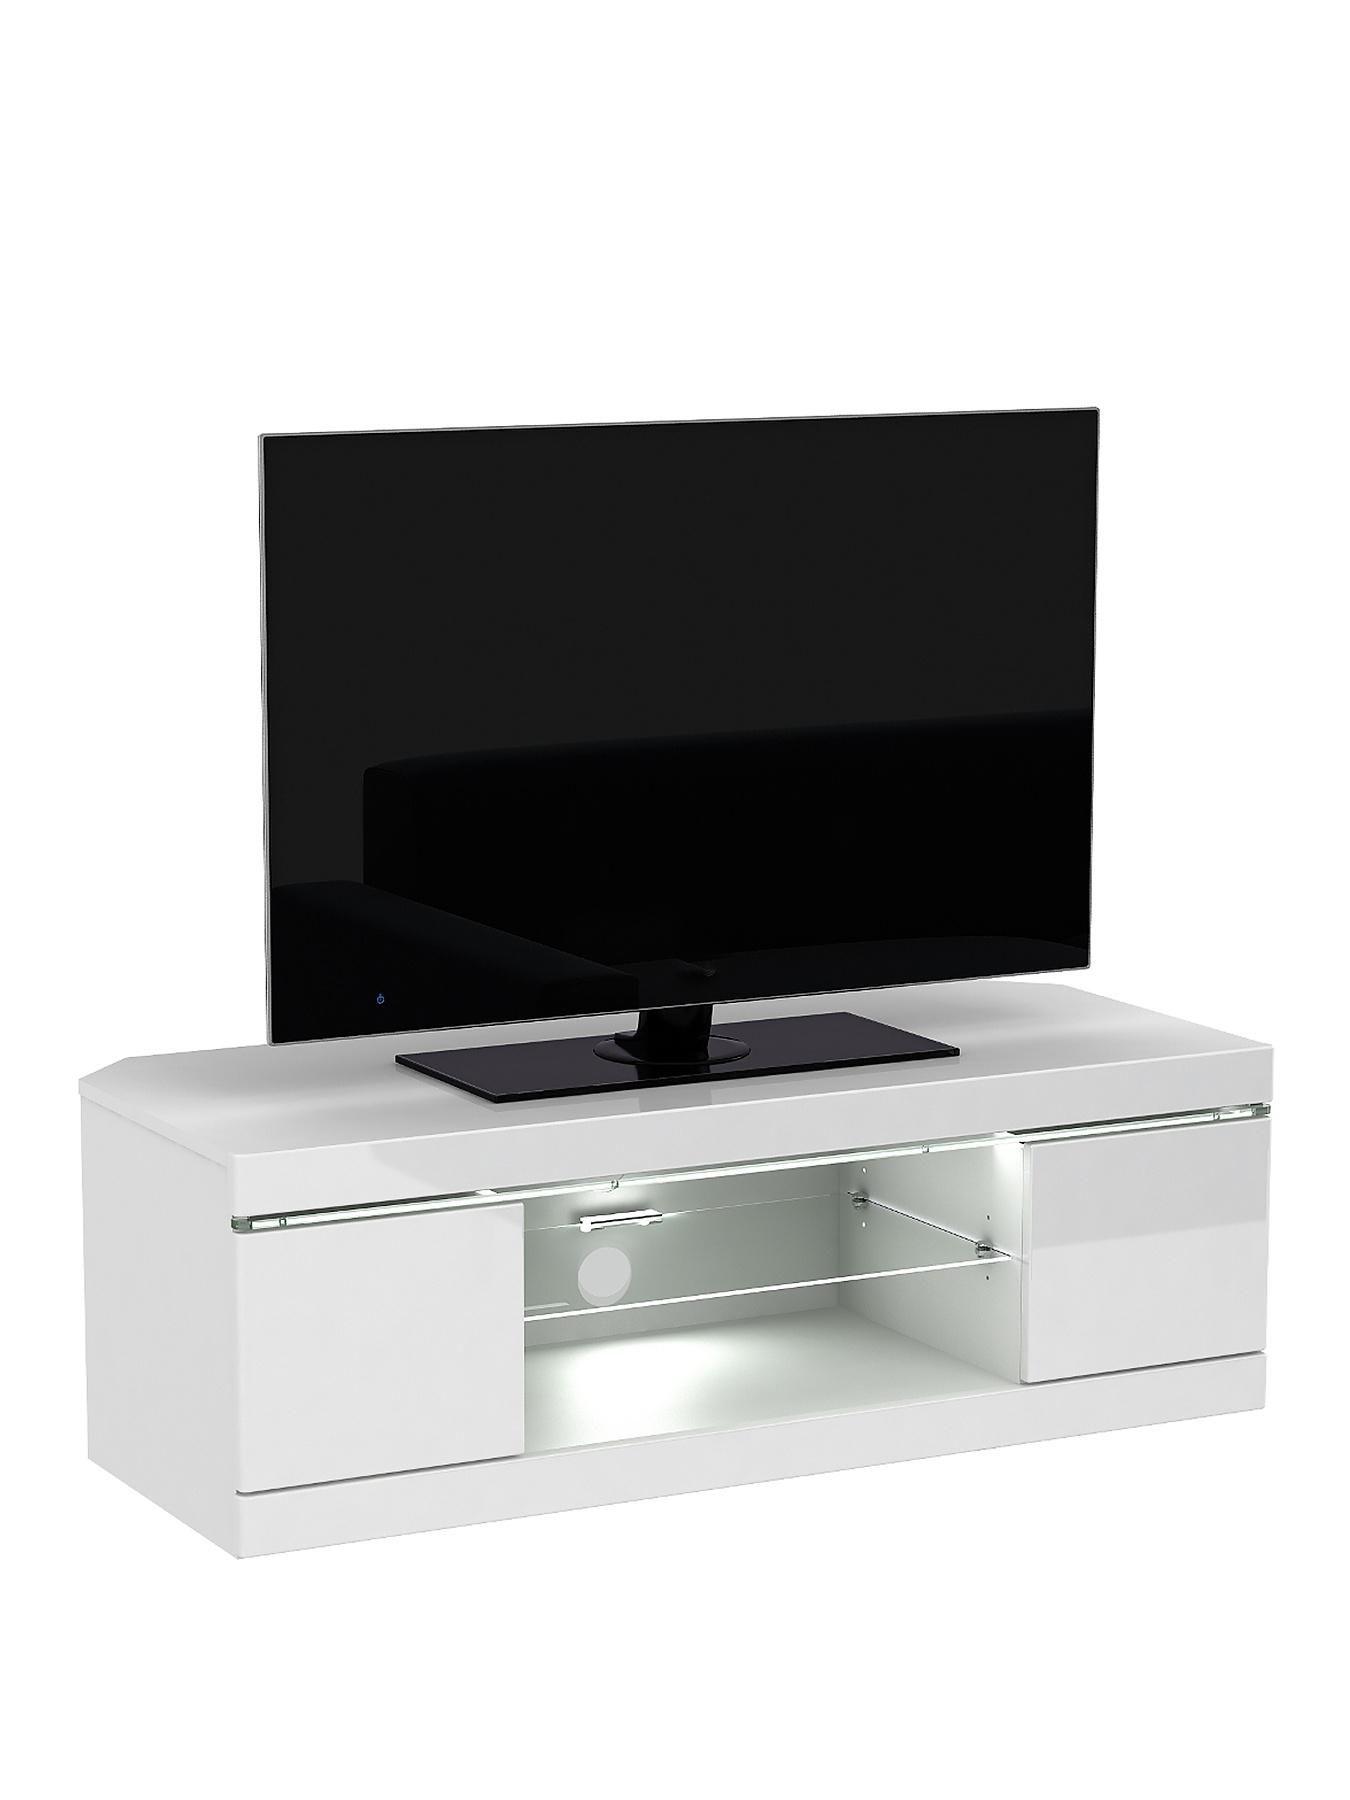 Innova Corner Tv Unit With Led Lights Fits Up To 50 Inch Tv Corner Tv Unit Corner Entertainment Center Corner Tv